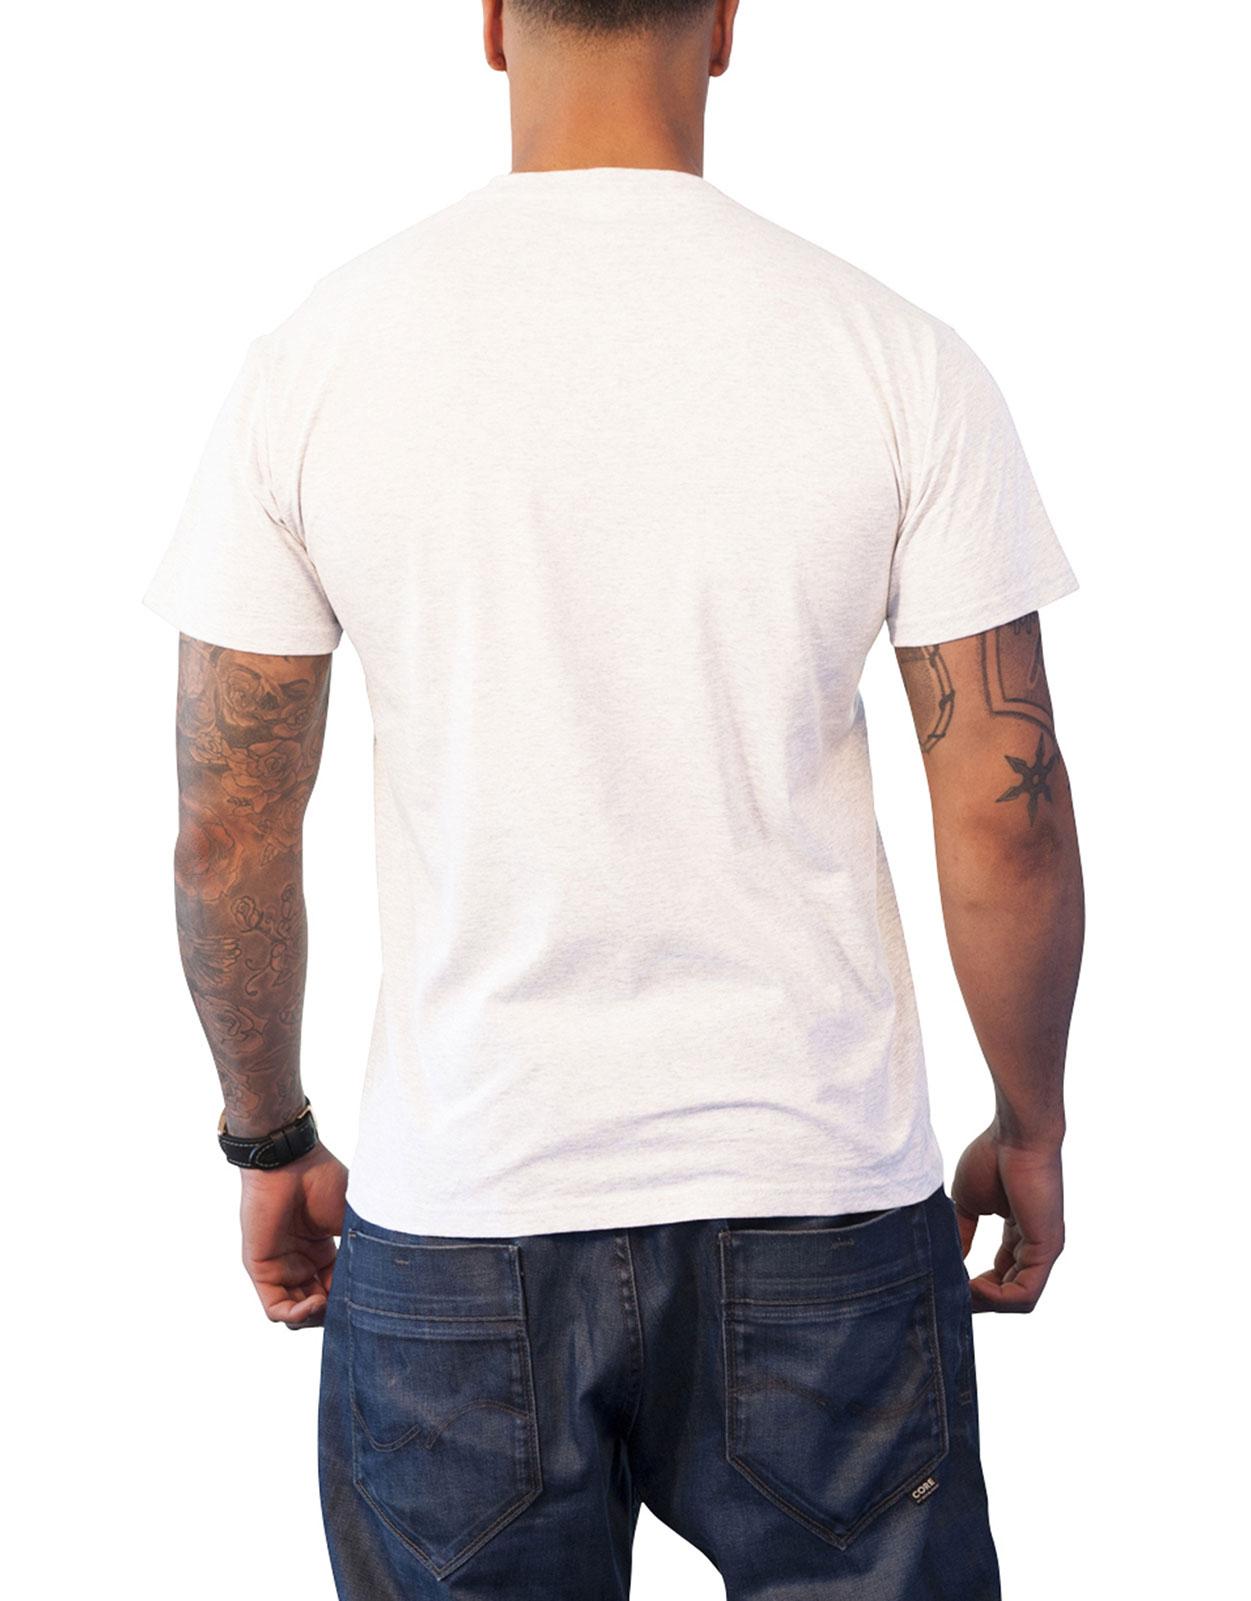 Camiseta-Last-Jedi-De-Star-Wars-Movie-Poster-porgs-Guardia-pretoriana-oficial-para-hombre miniatura 17